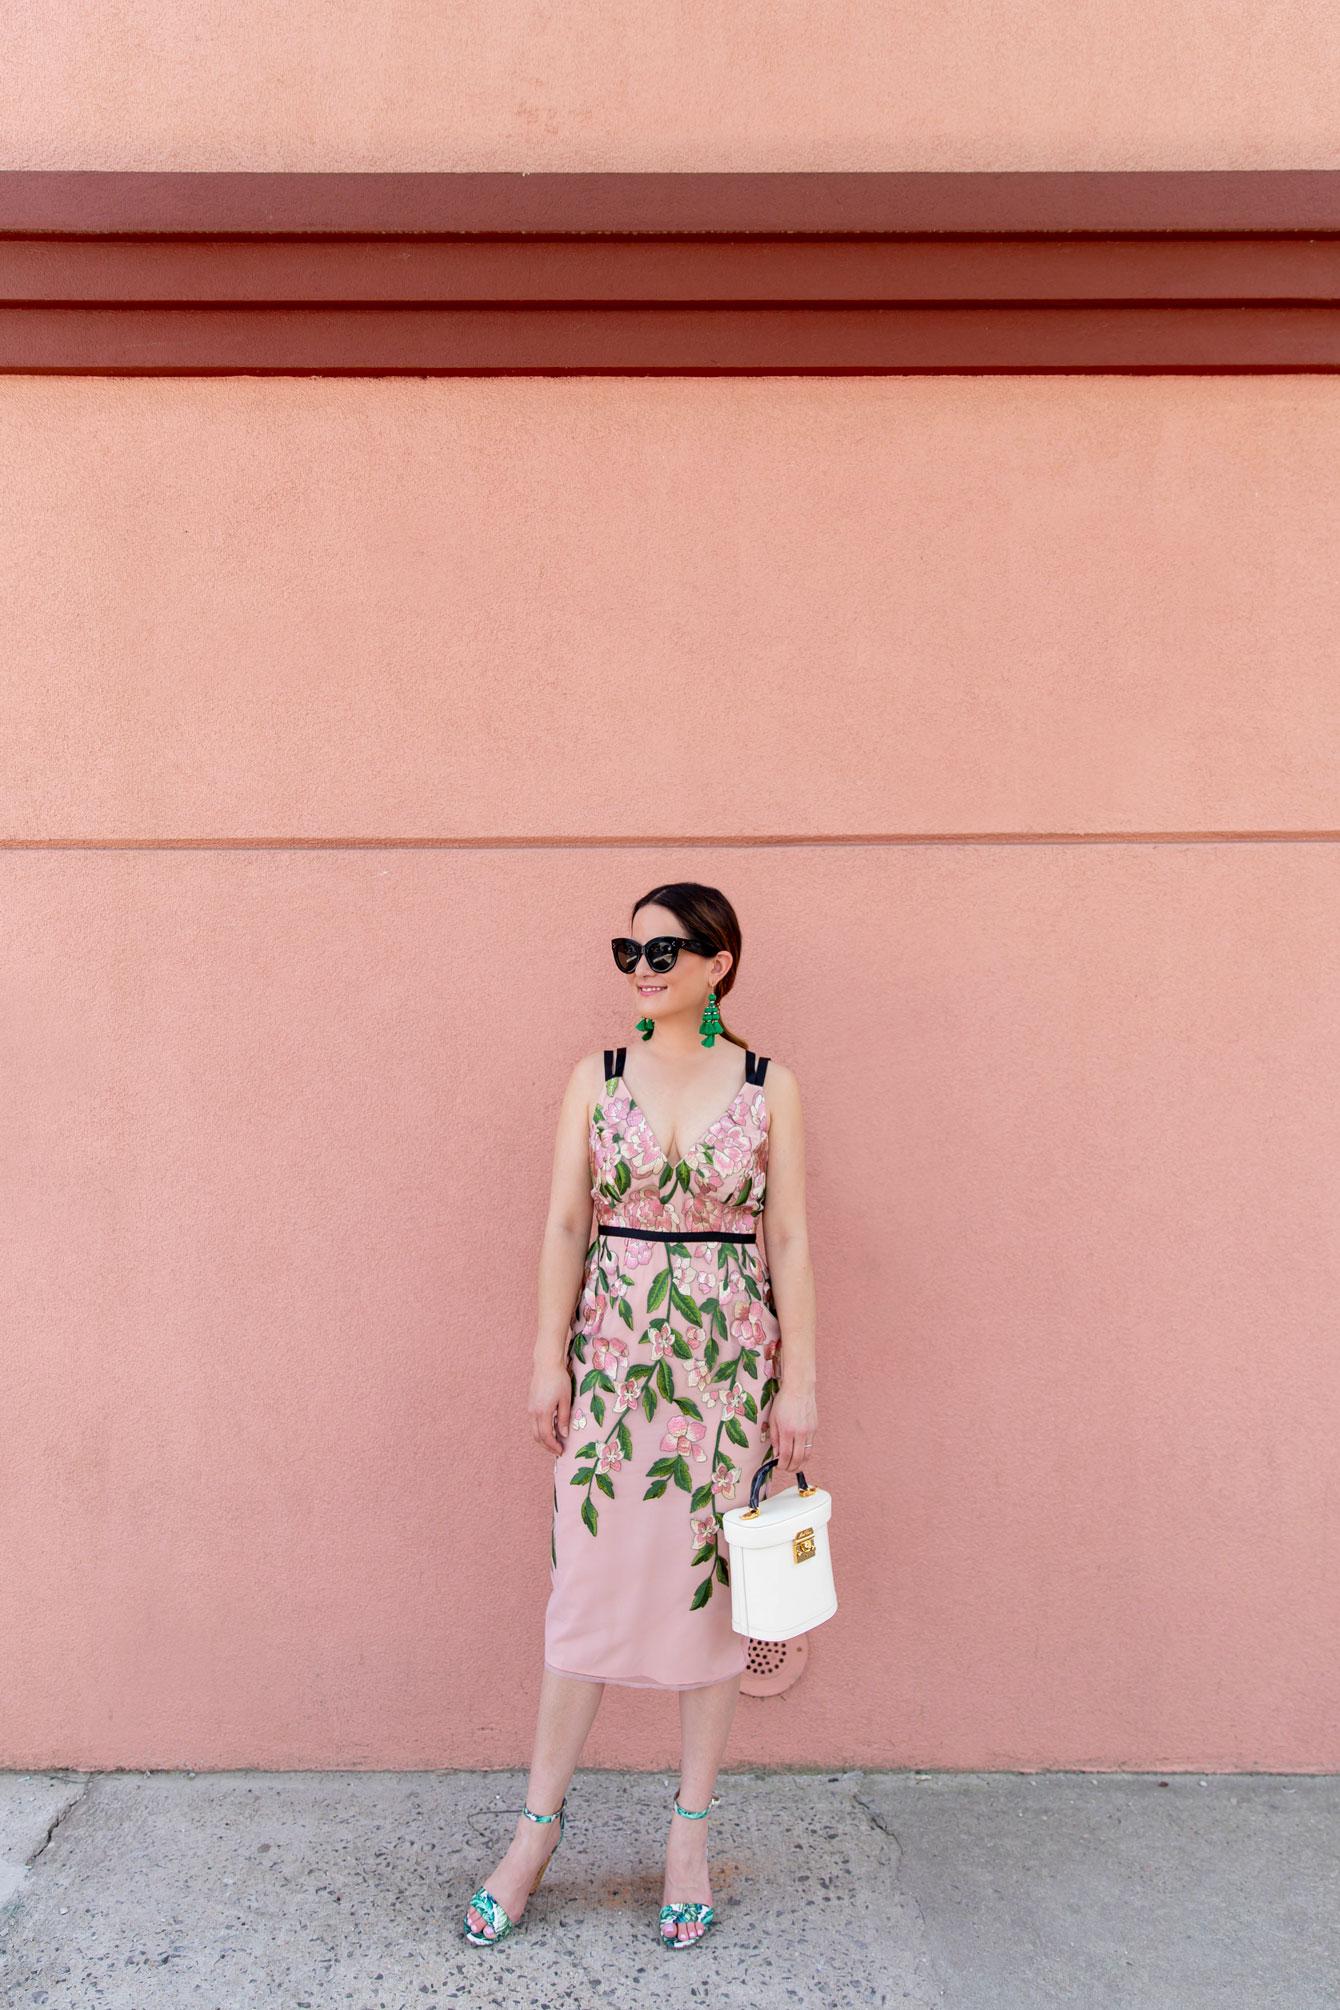 Brooklyn Pink Wall